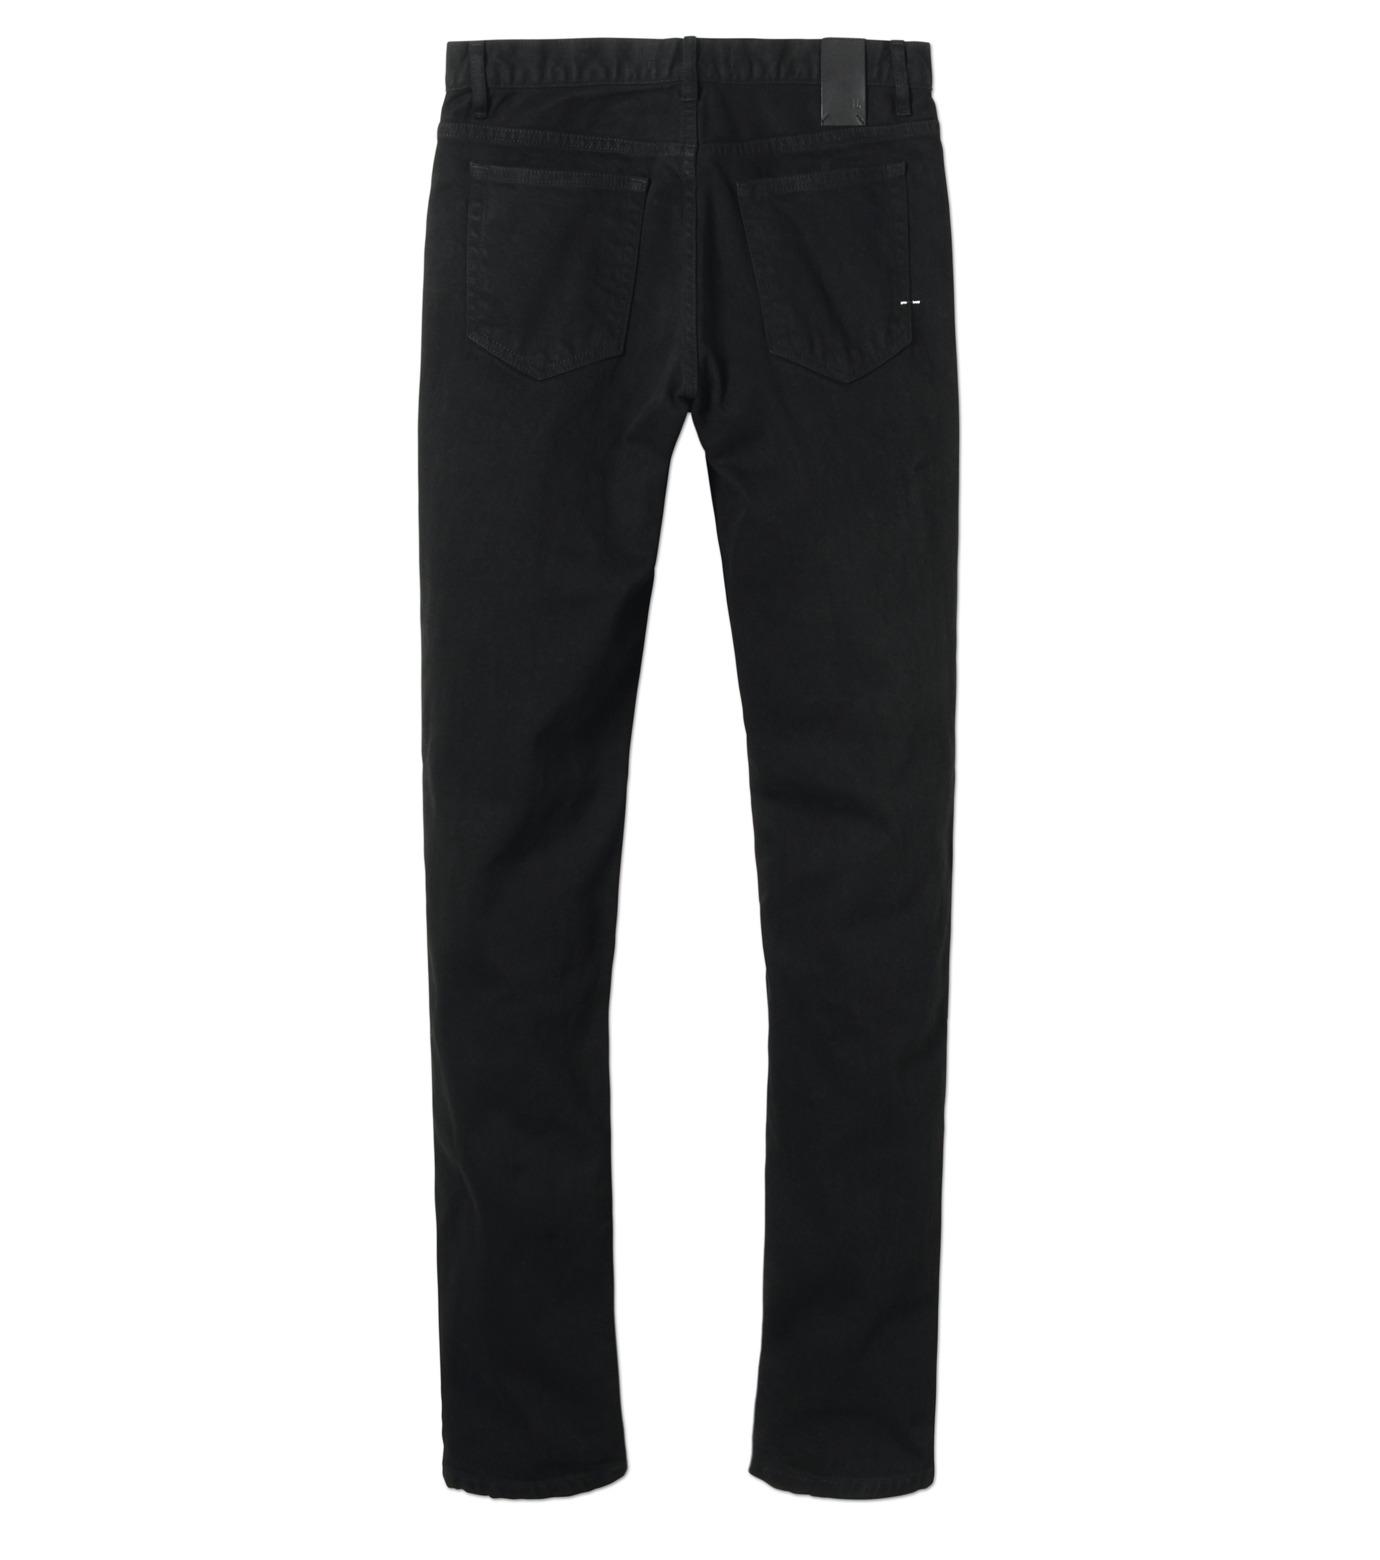 HL HEDDIE LOVU(エイチエル・エディールーヴ)のBLACK DENIM SLIM-BLACK(パンツ/pants)-17A98007-13 拡大詳細画像5